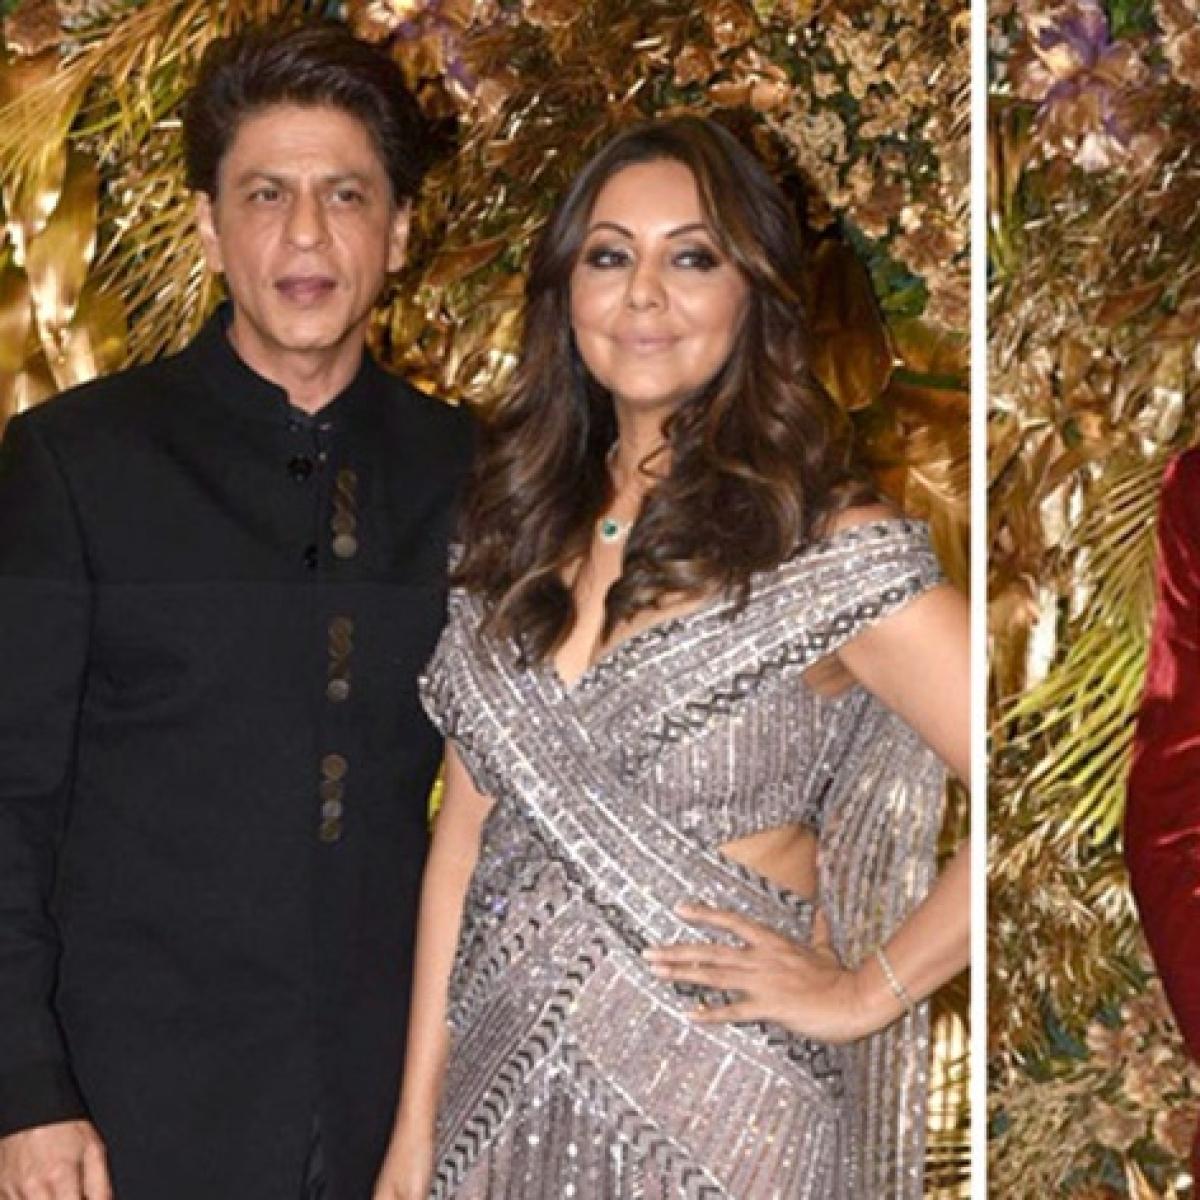 Shah Rukh, Gauri Khan, Karan Johar set the stage on fire with 'Kajra Re' moves at Armaan Jain's reception